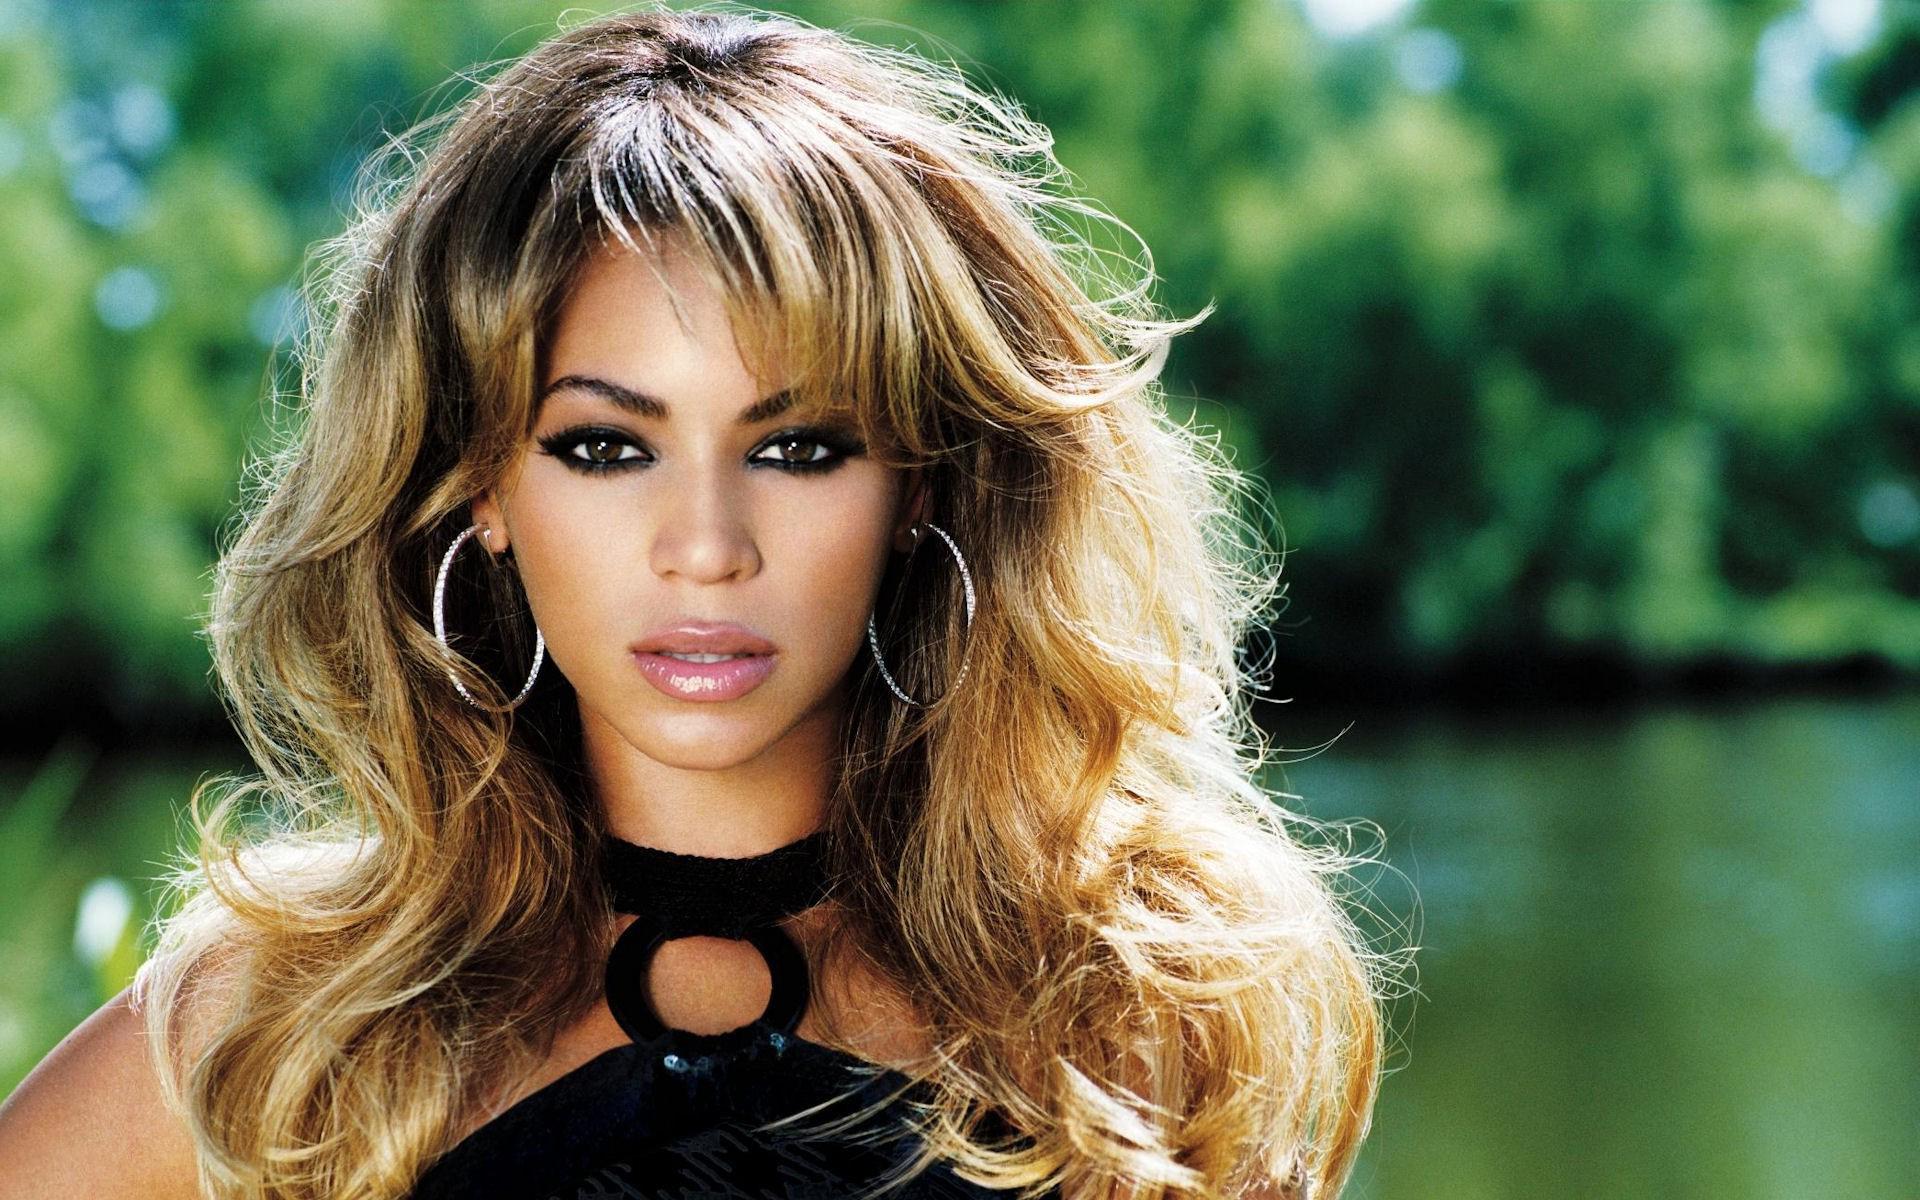 Beyonce Knowles Wallpapers Hd | Hd Wallpapers